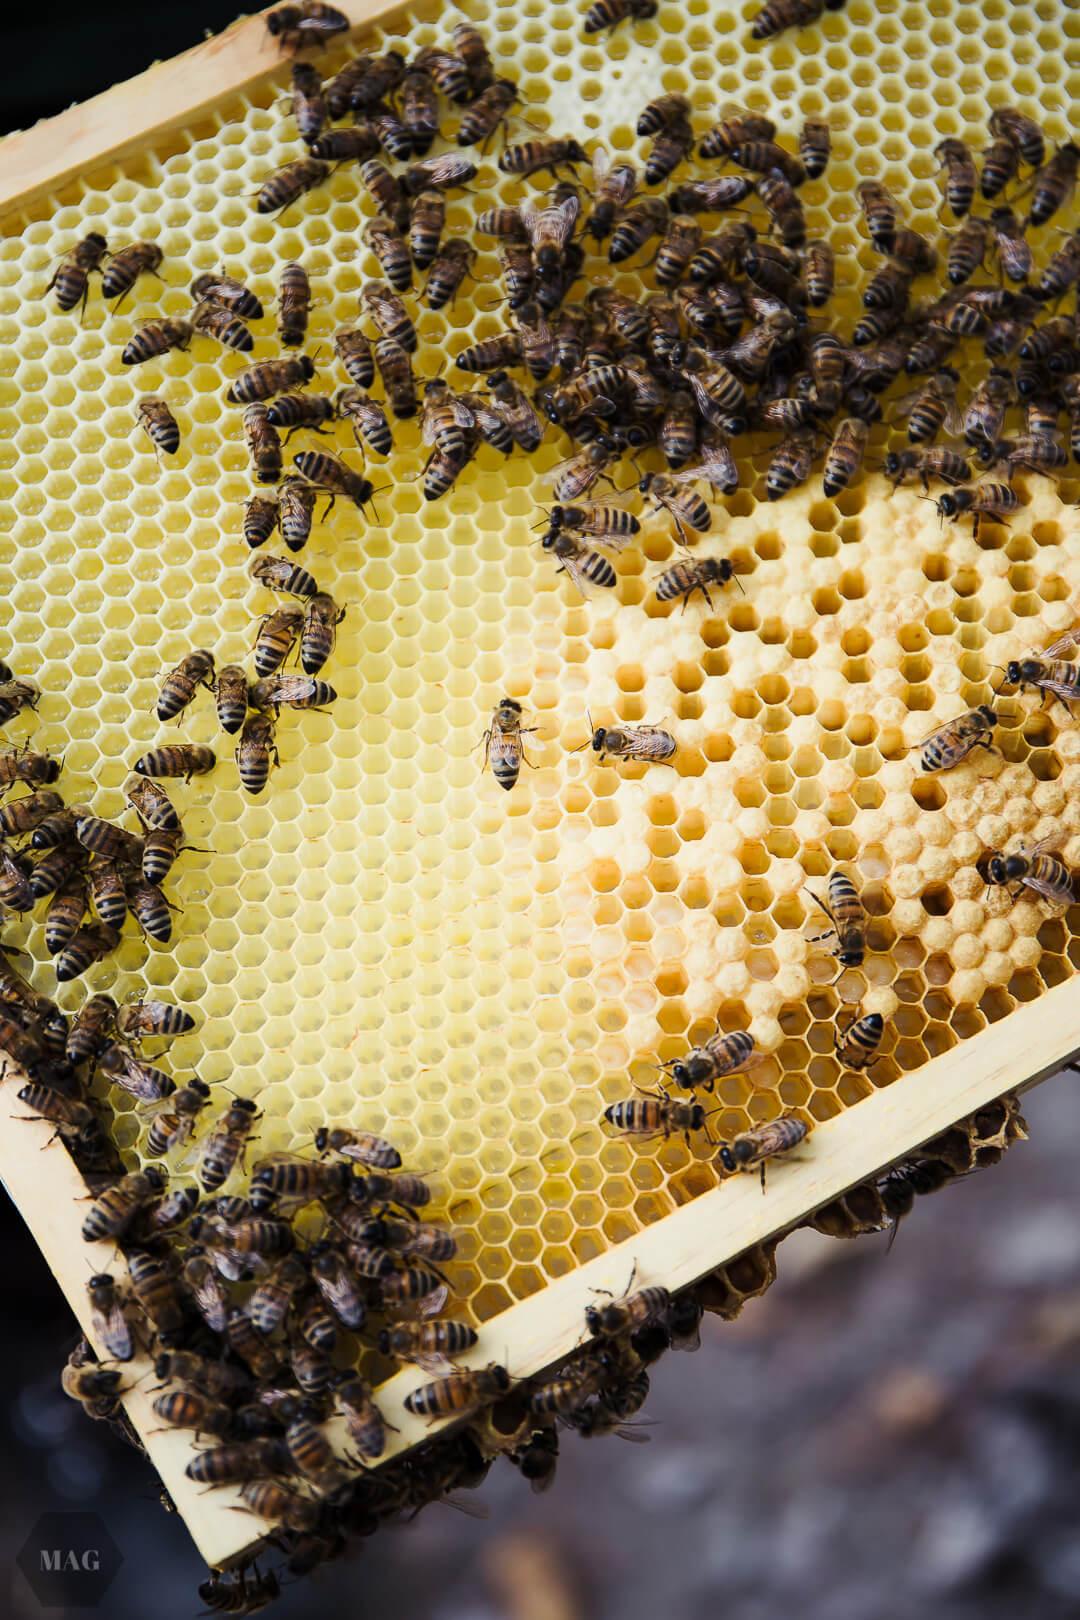 Bienen und Veganer, Bienen vegan, Honig vegan, Veganer und Honig, Honig und vegan, Honig vegan, veganer Honig, guter Honig, wesensgerecht Imkern, Honig Tierschutz, Honig Naturschutz